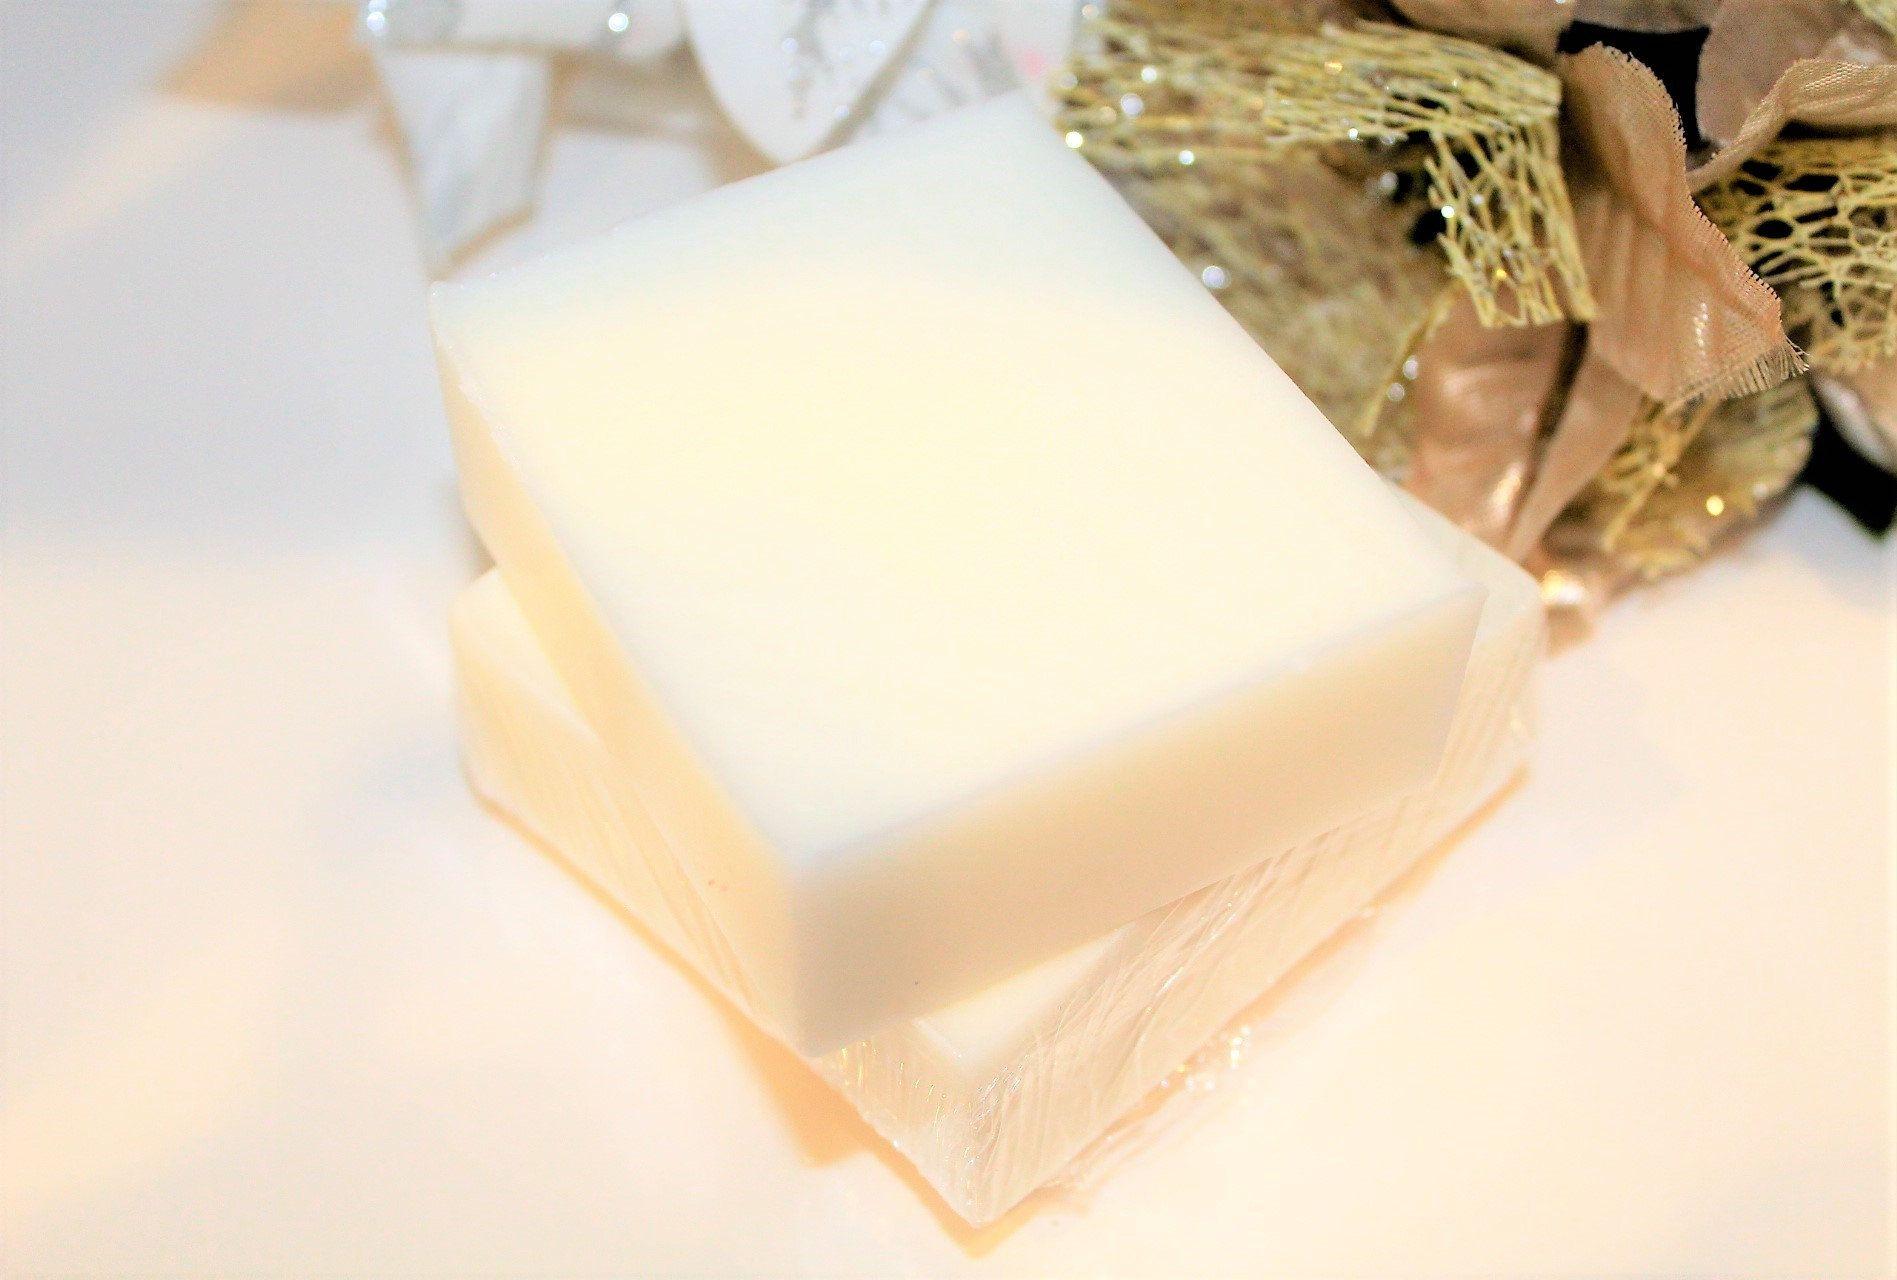 Handmade Soap Buttermilk Soap Natural Skin Care Dry Skin